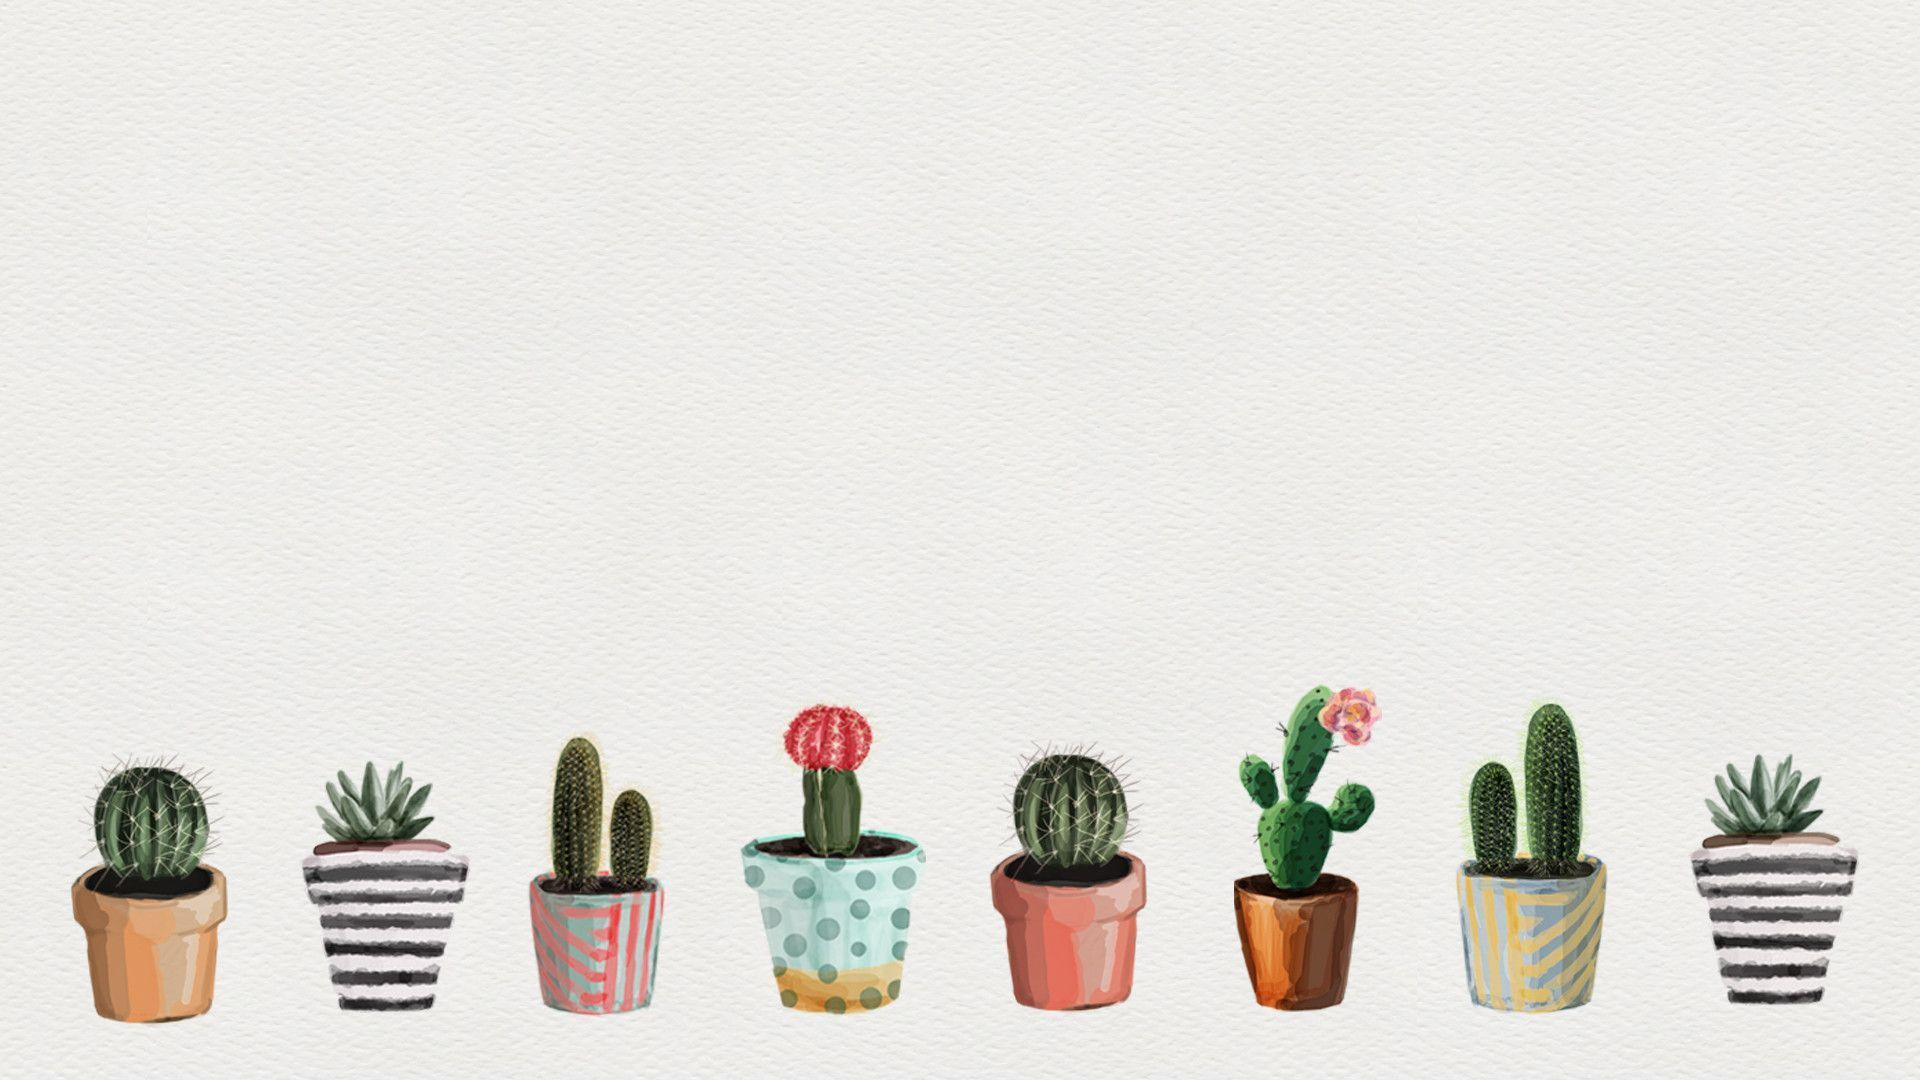 Succulents Desktop Wallpapers Top Free Succulents Desktop Backgrounds Wallpaperaccess